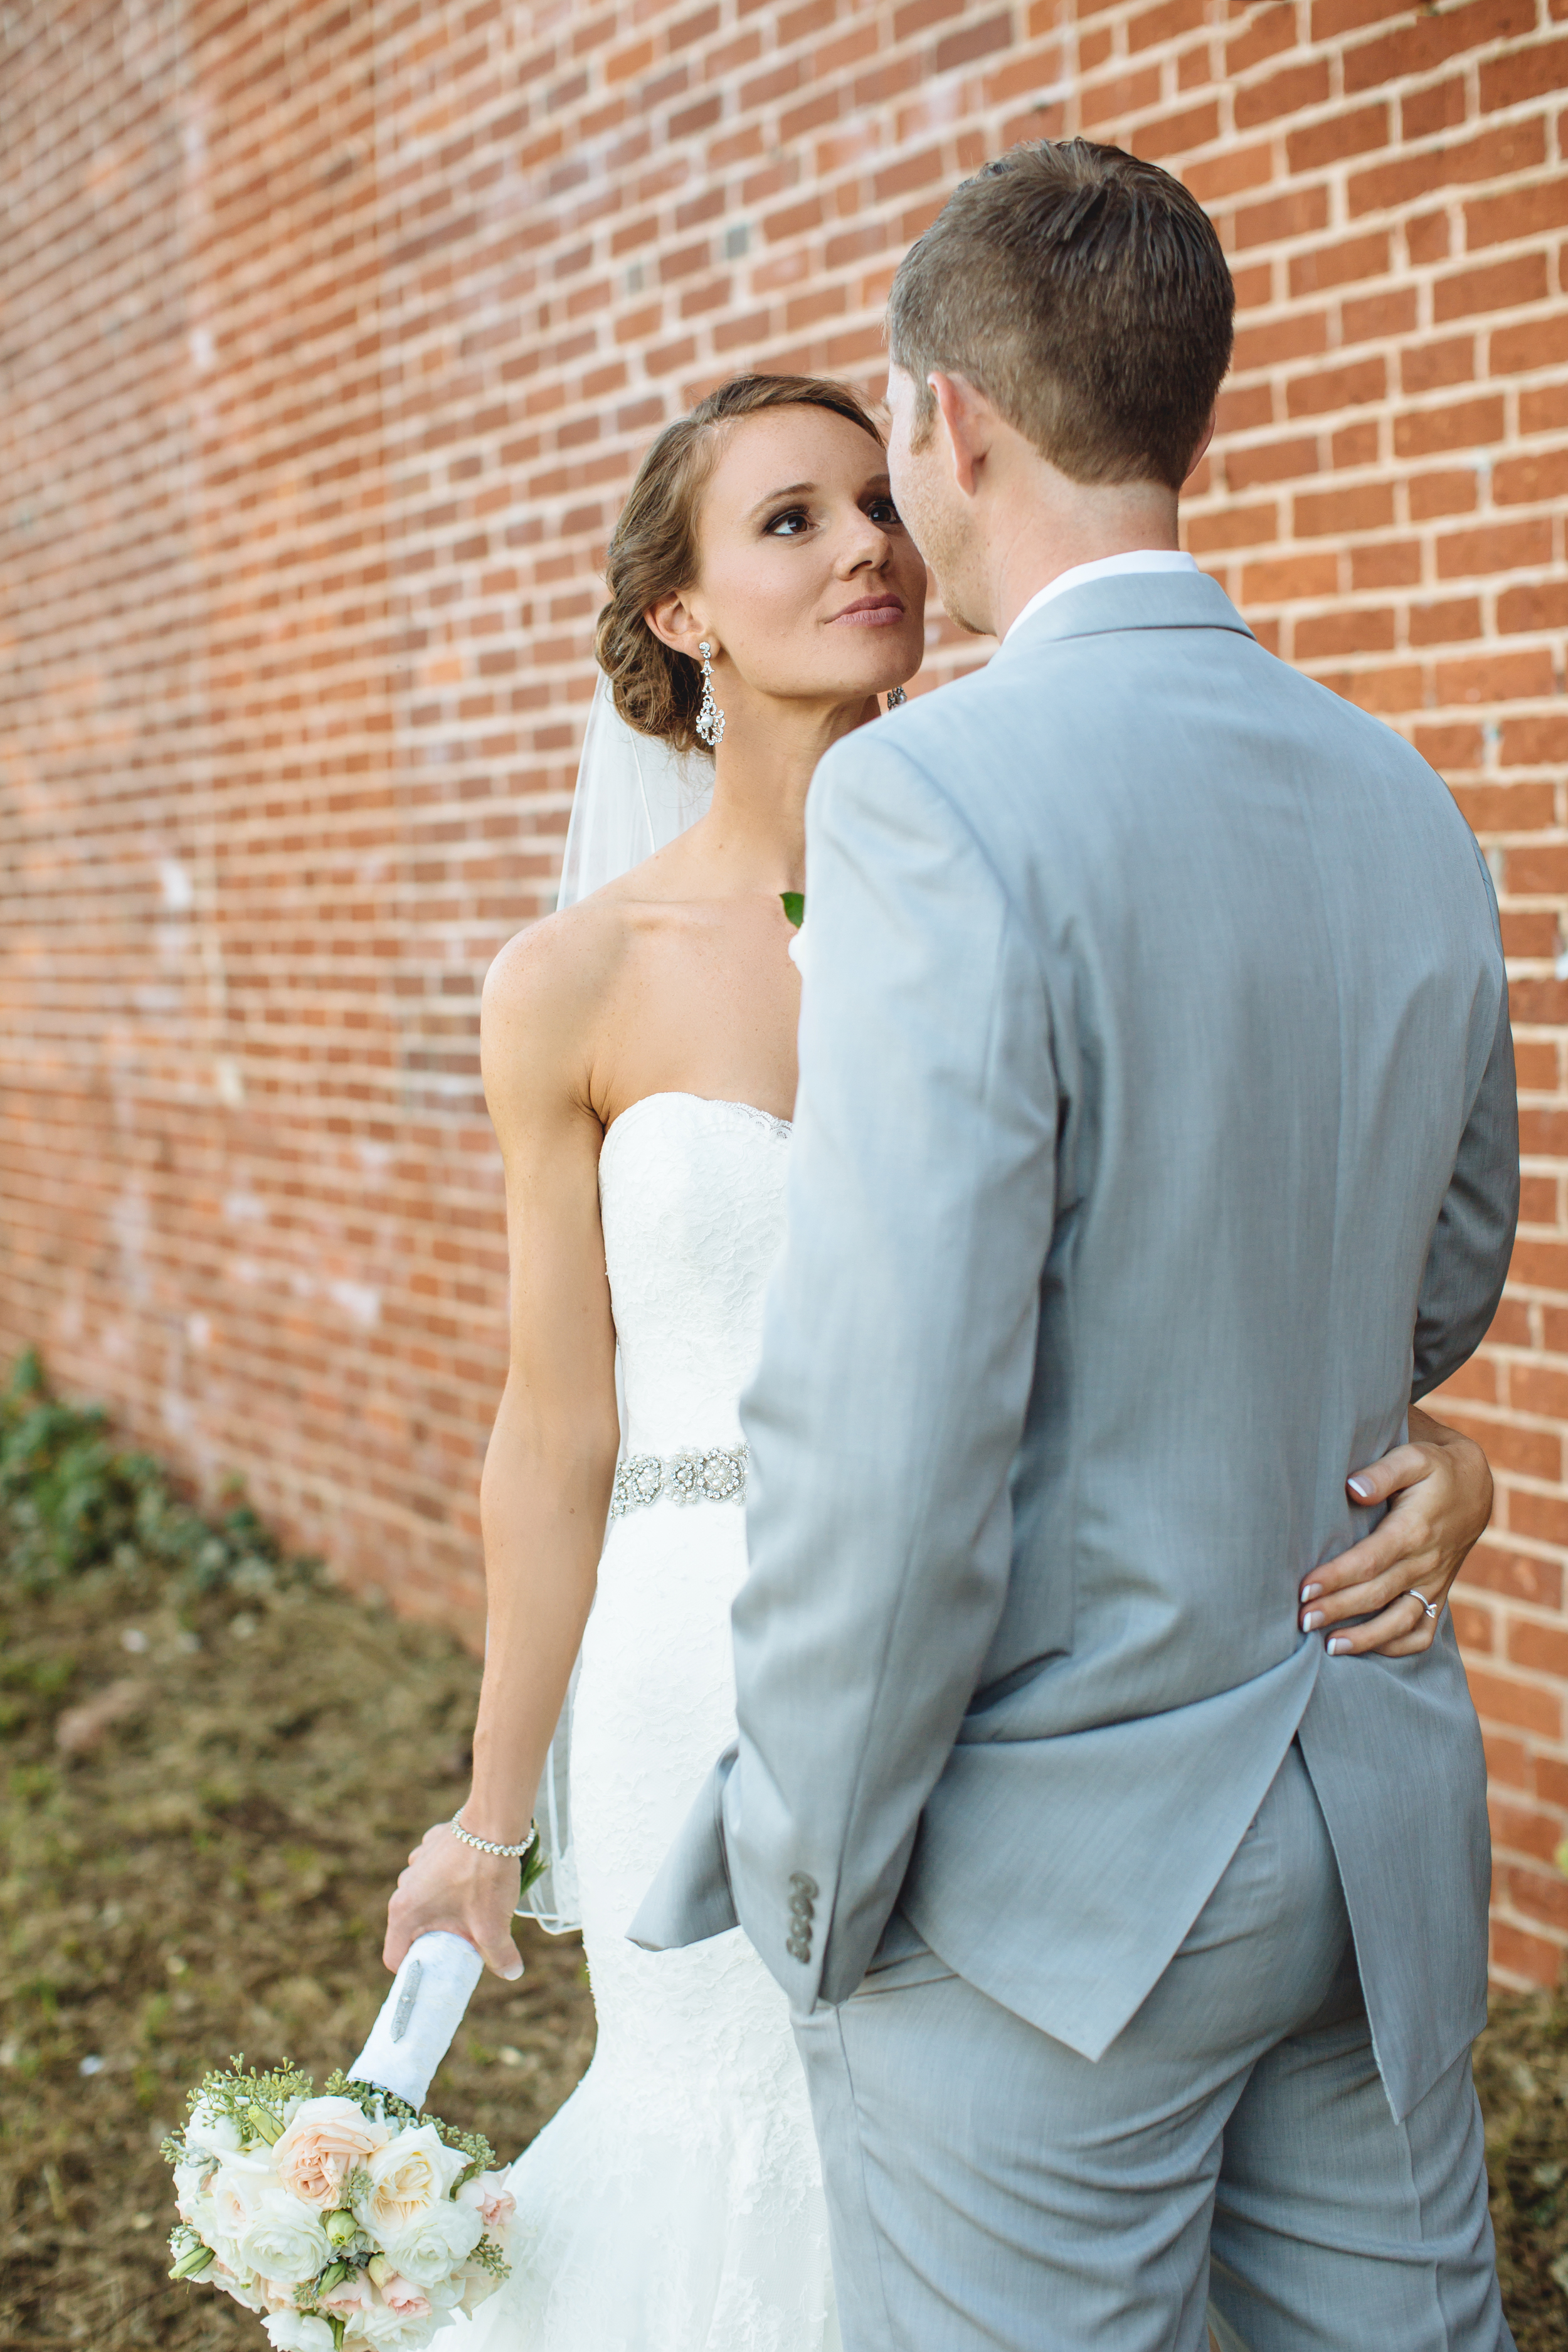 Hibbard wedding blog 1-106.jpg